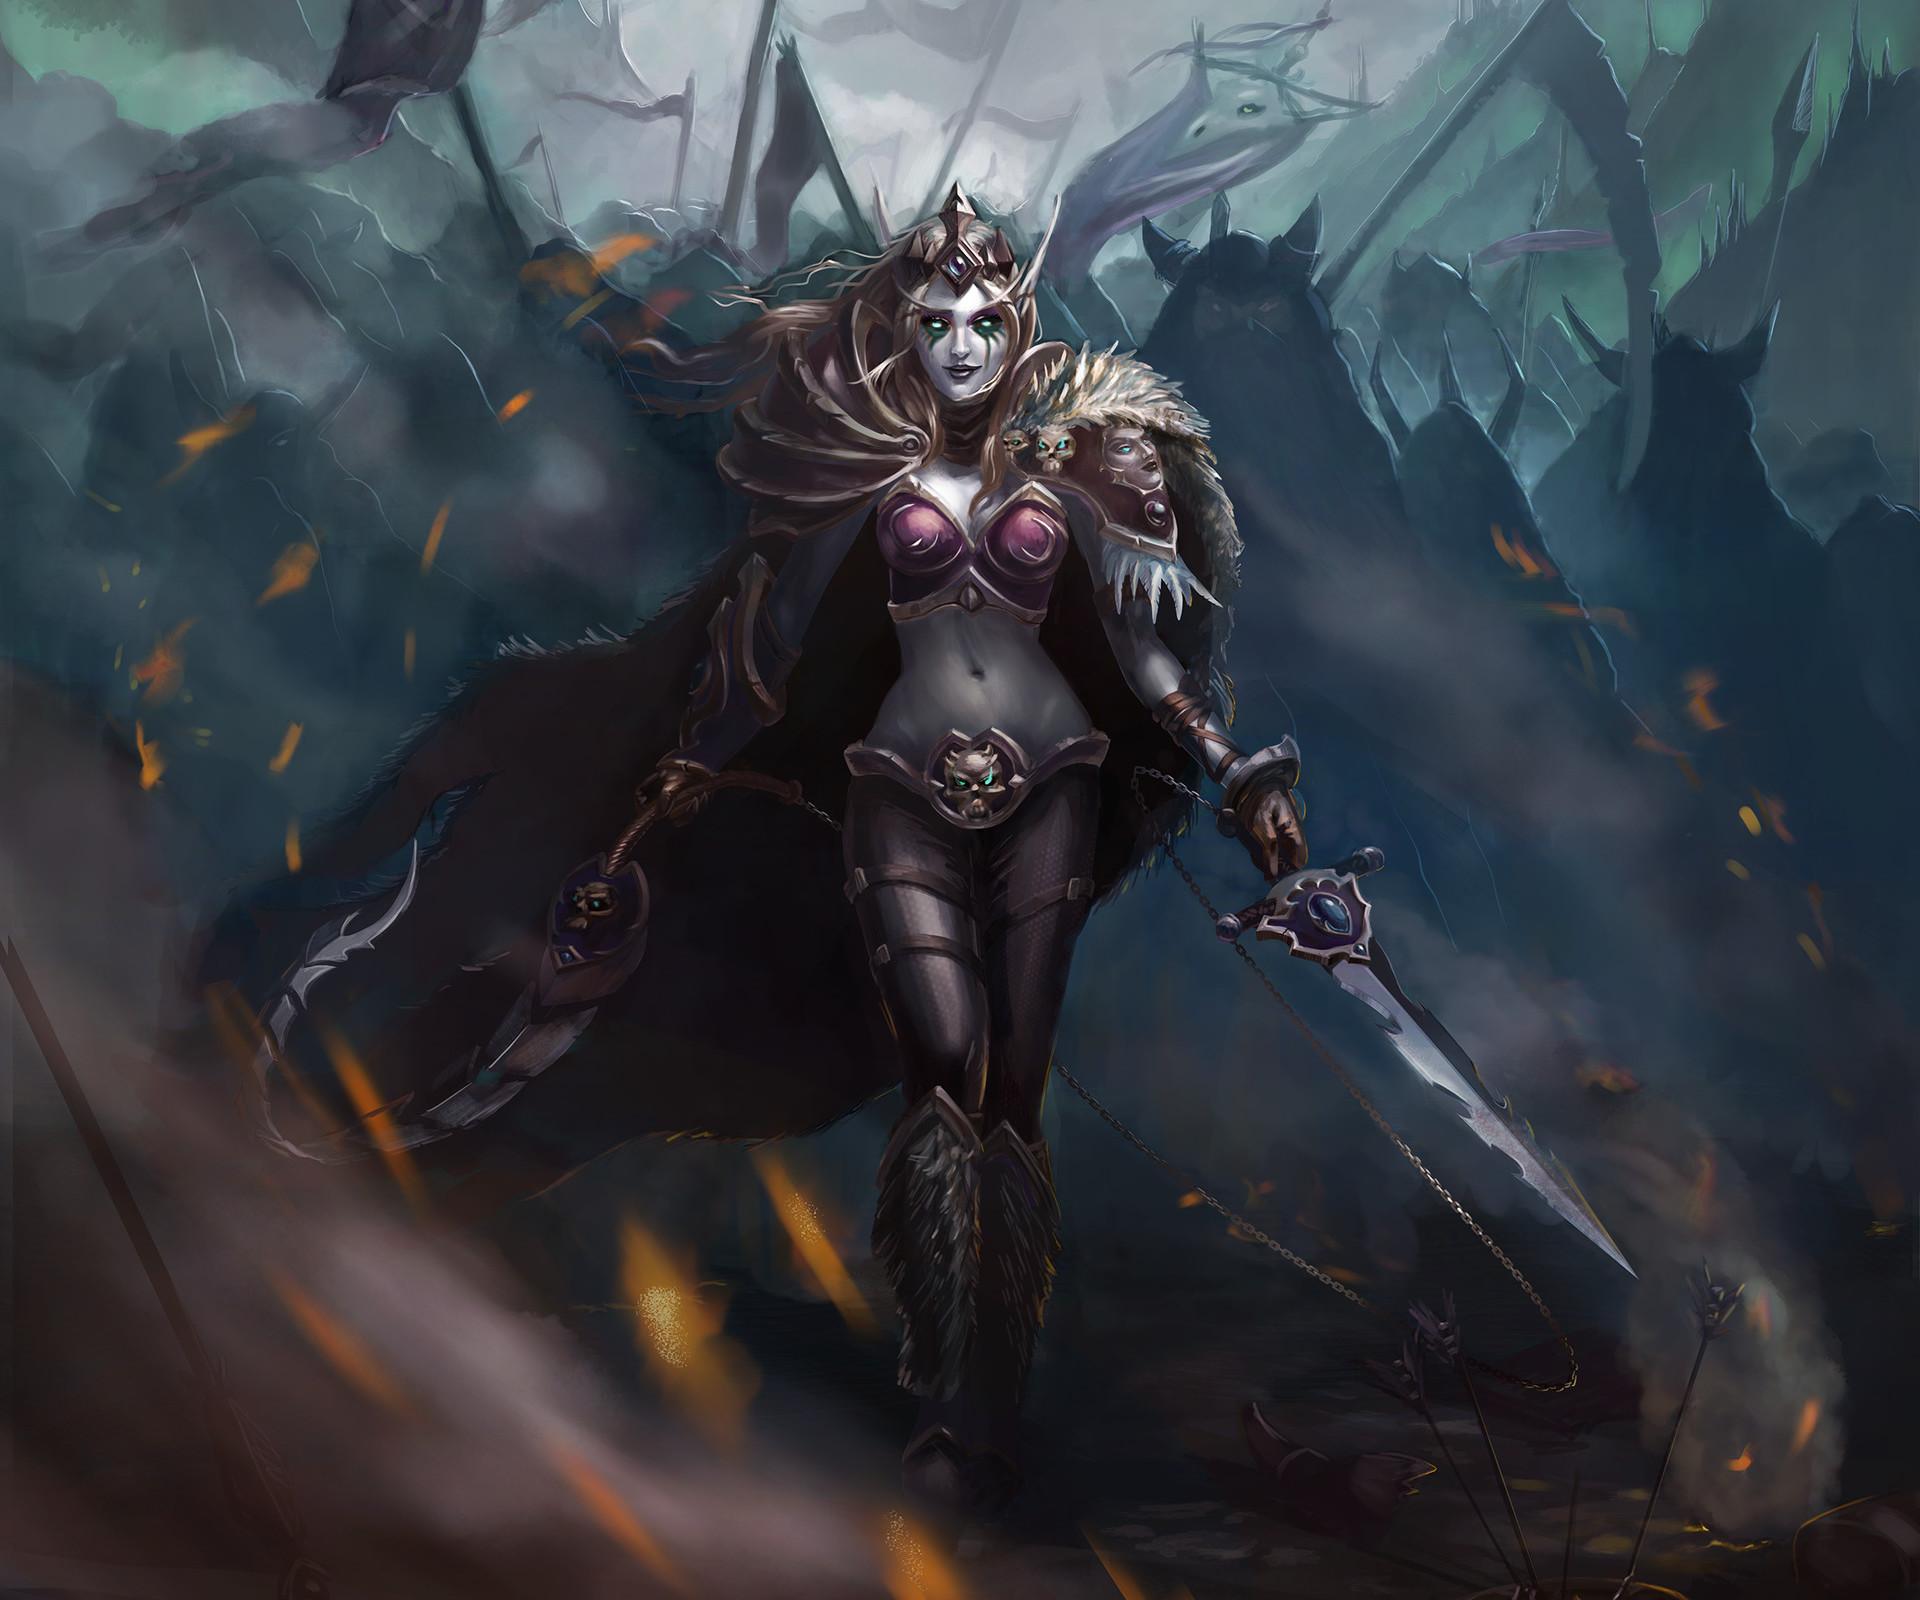 Video Game – World Of Warcraft Fantasy Woman Girl Woman Warrior Armor Sword Sylvanas  Windrunner Wallpaper